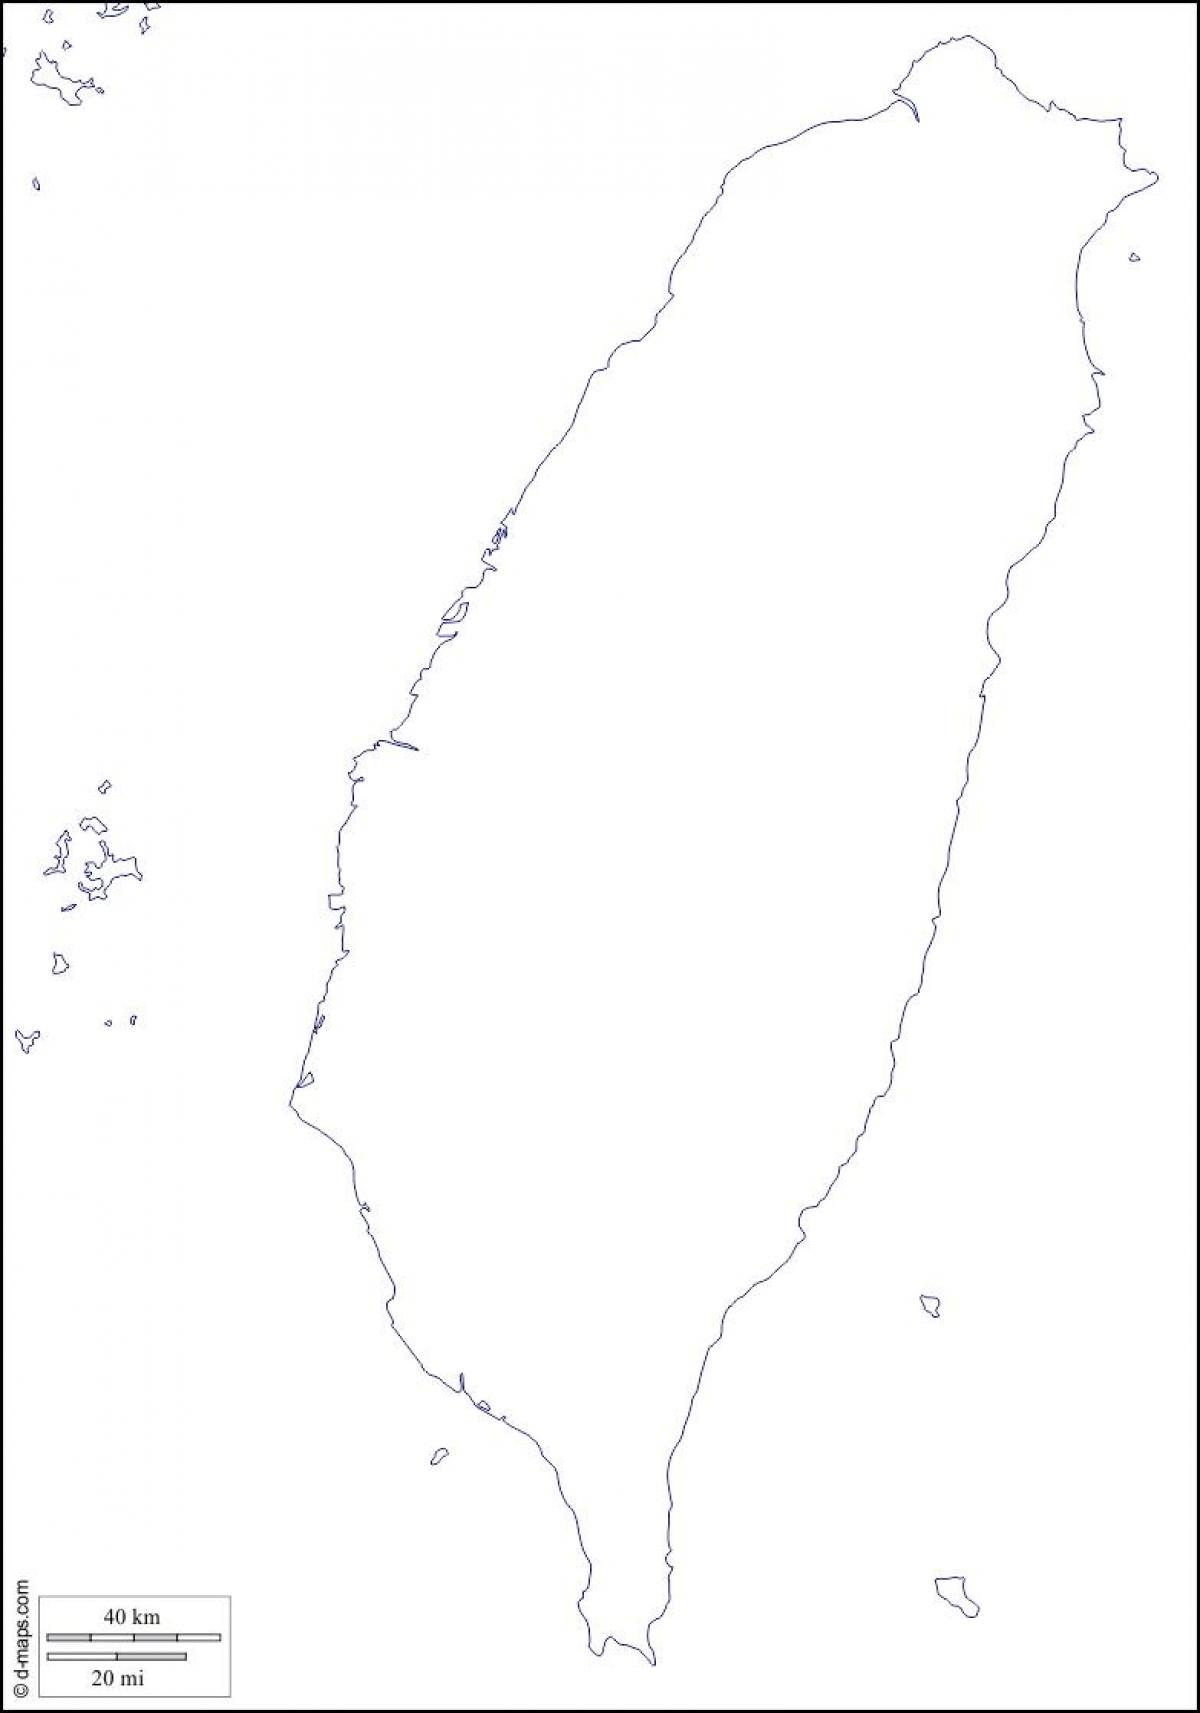 Carte Asie Vierge.Taiwan Carte Vierge Carte De Taiwan Vide Asie De L Est Asie